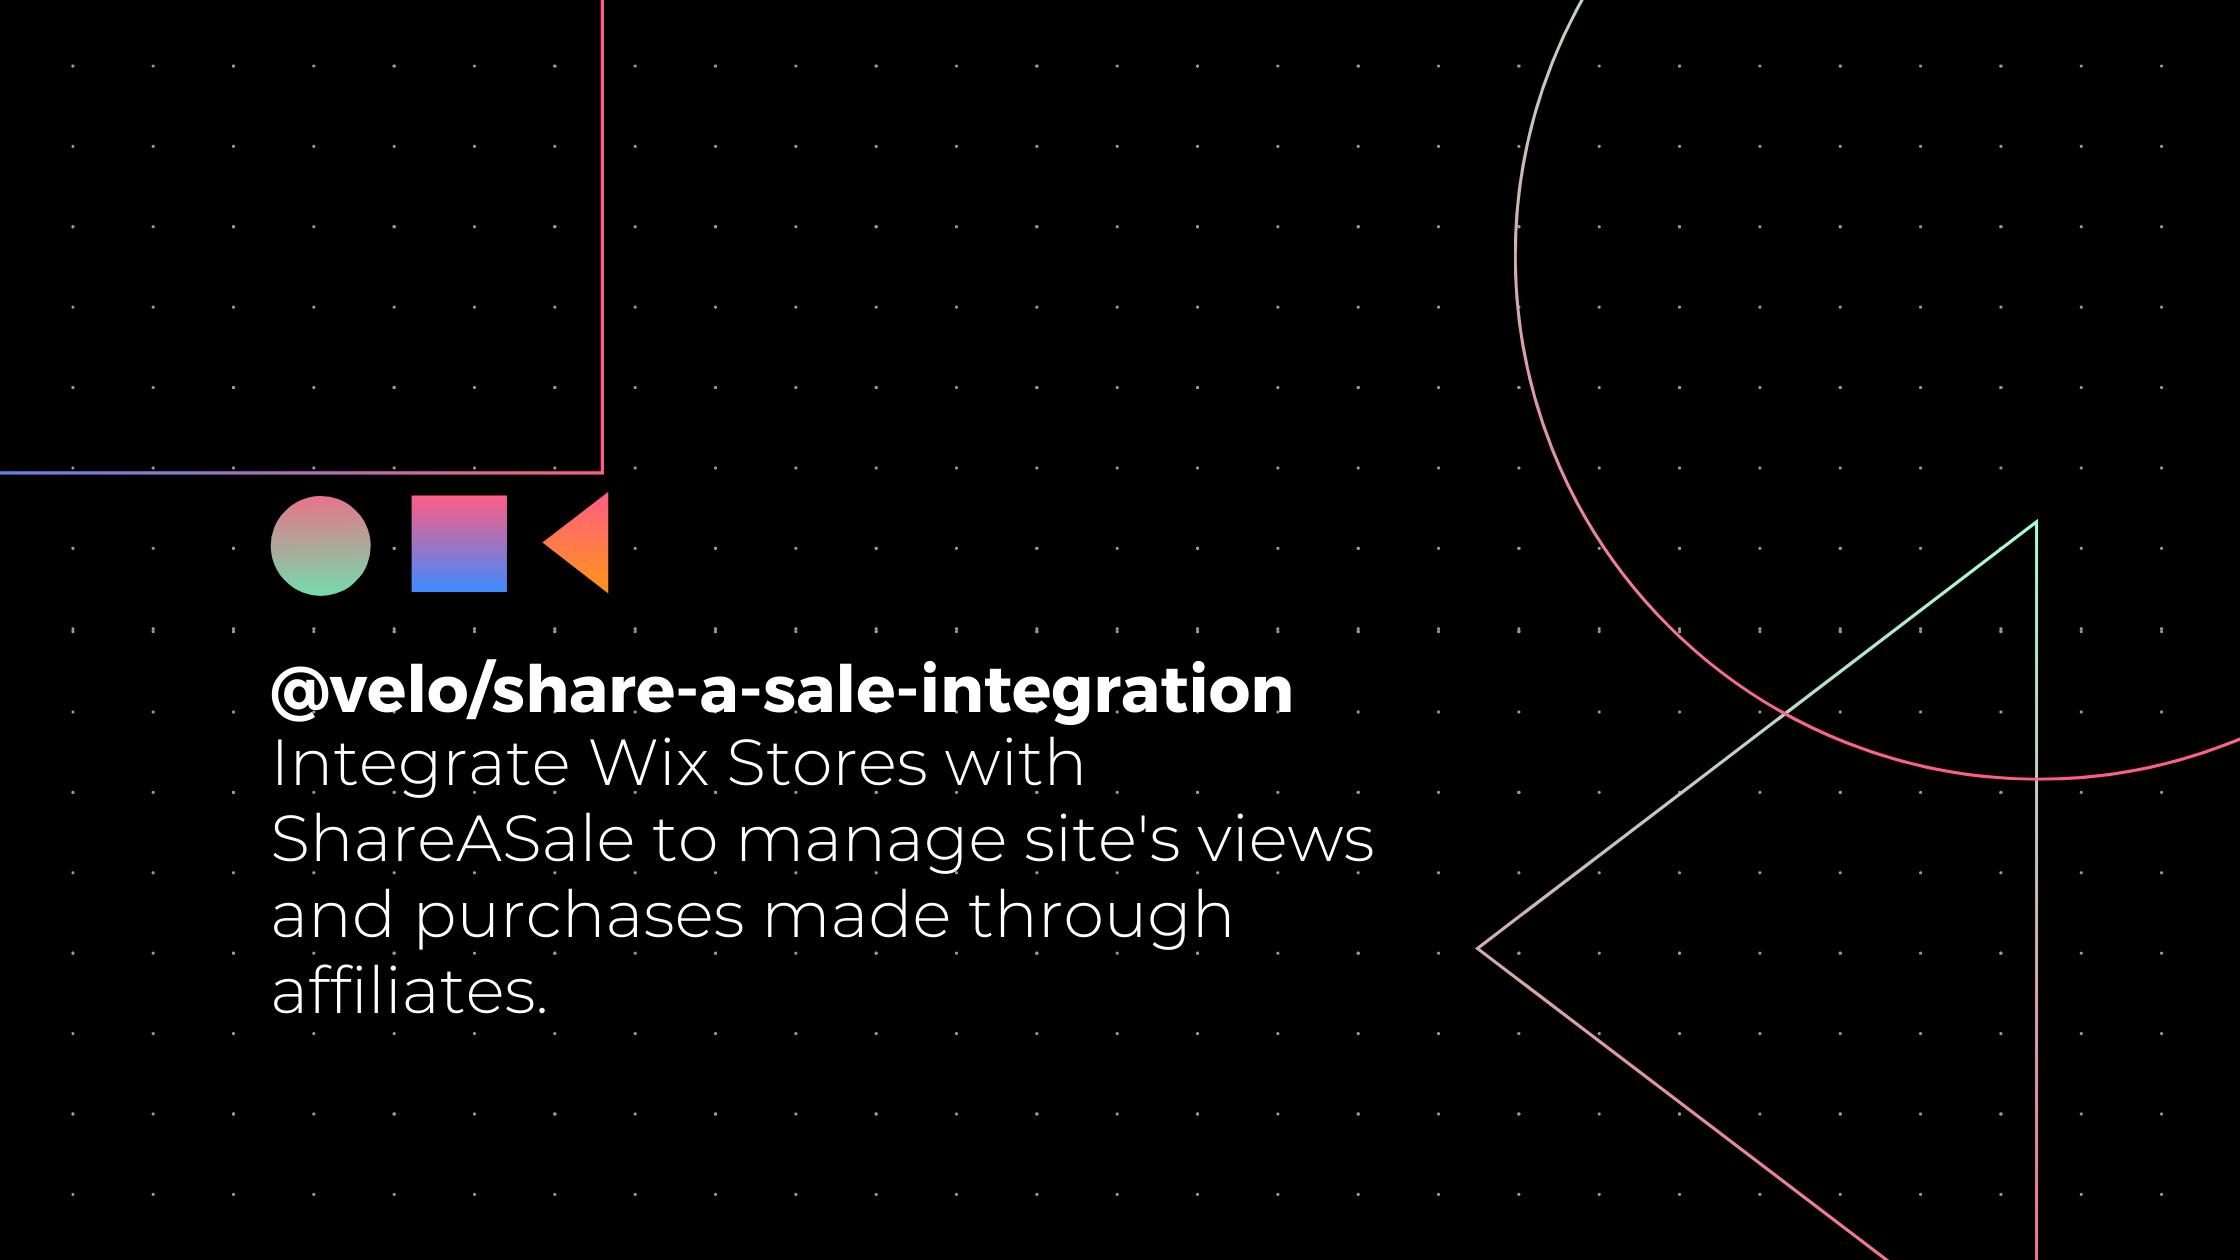 @velo/share-a-sale-integration